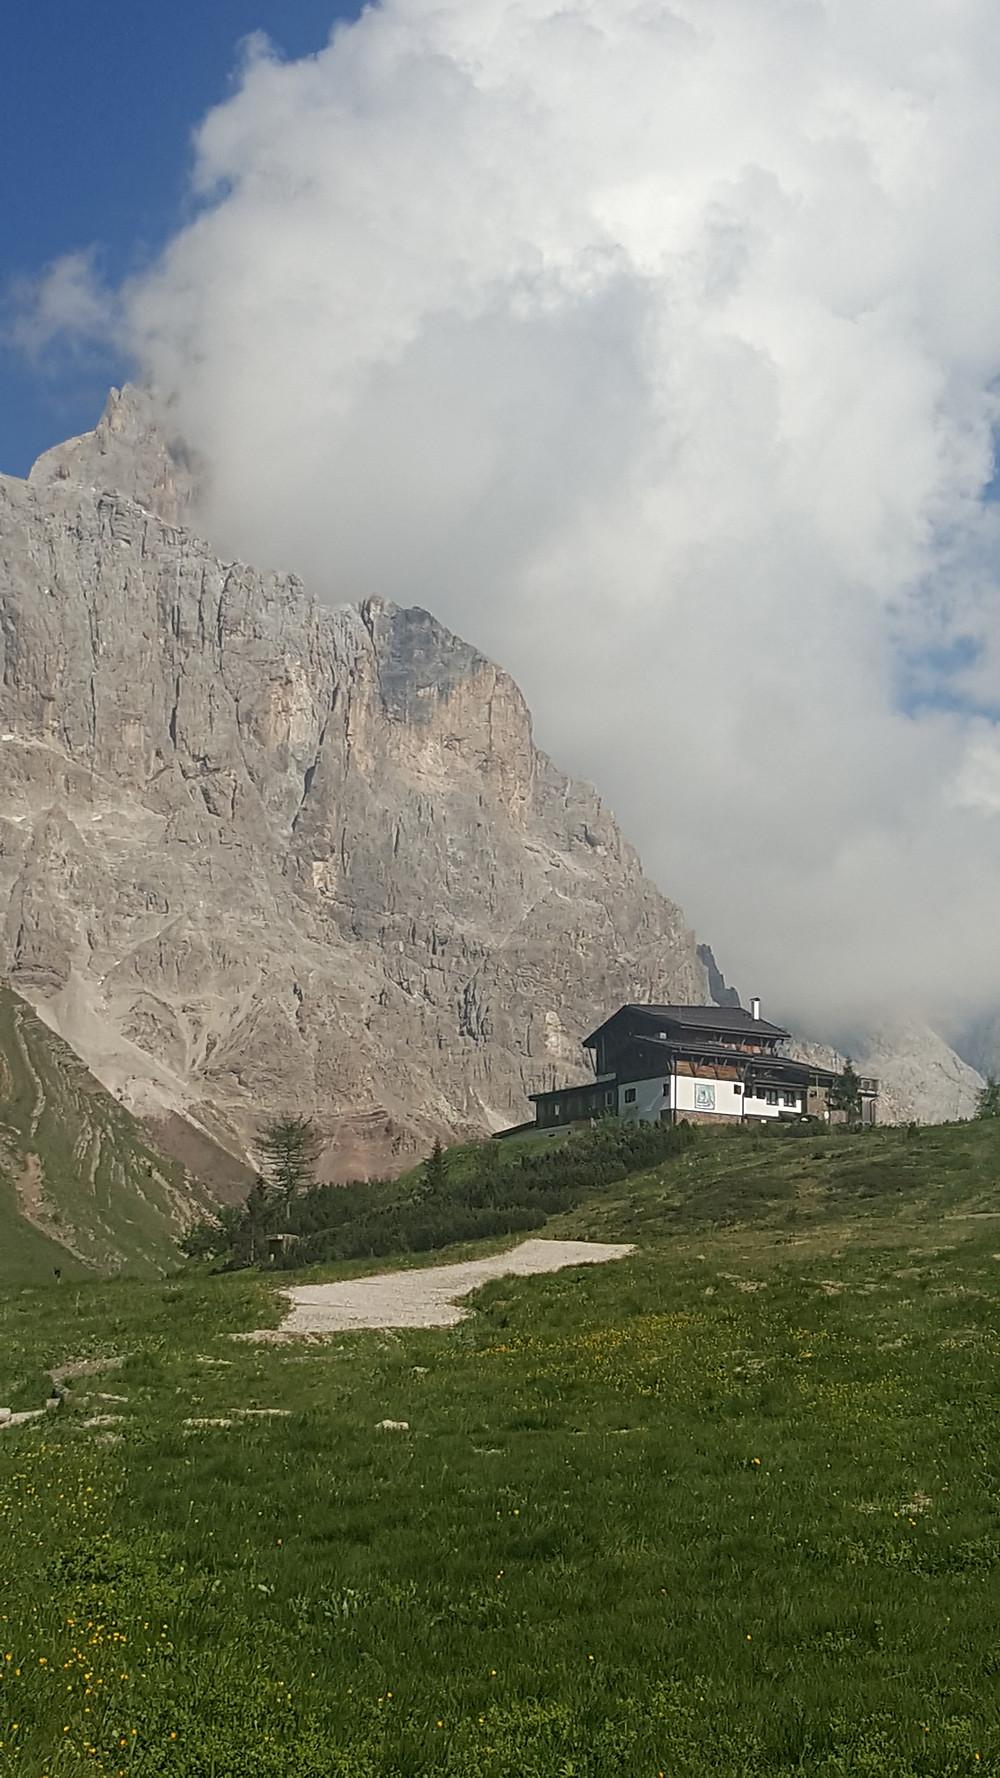 Dolomites - Belluno, Italy - Life Itinerant